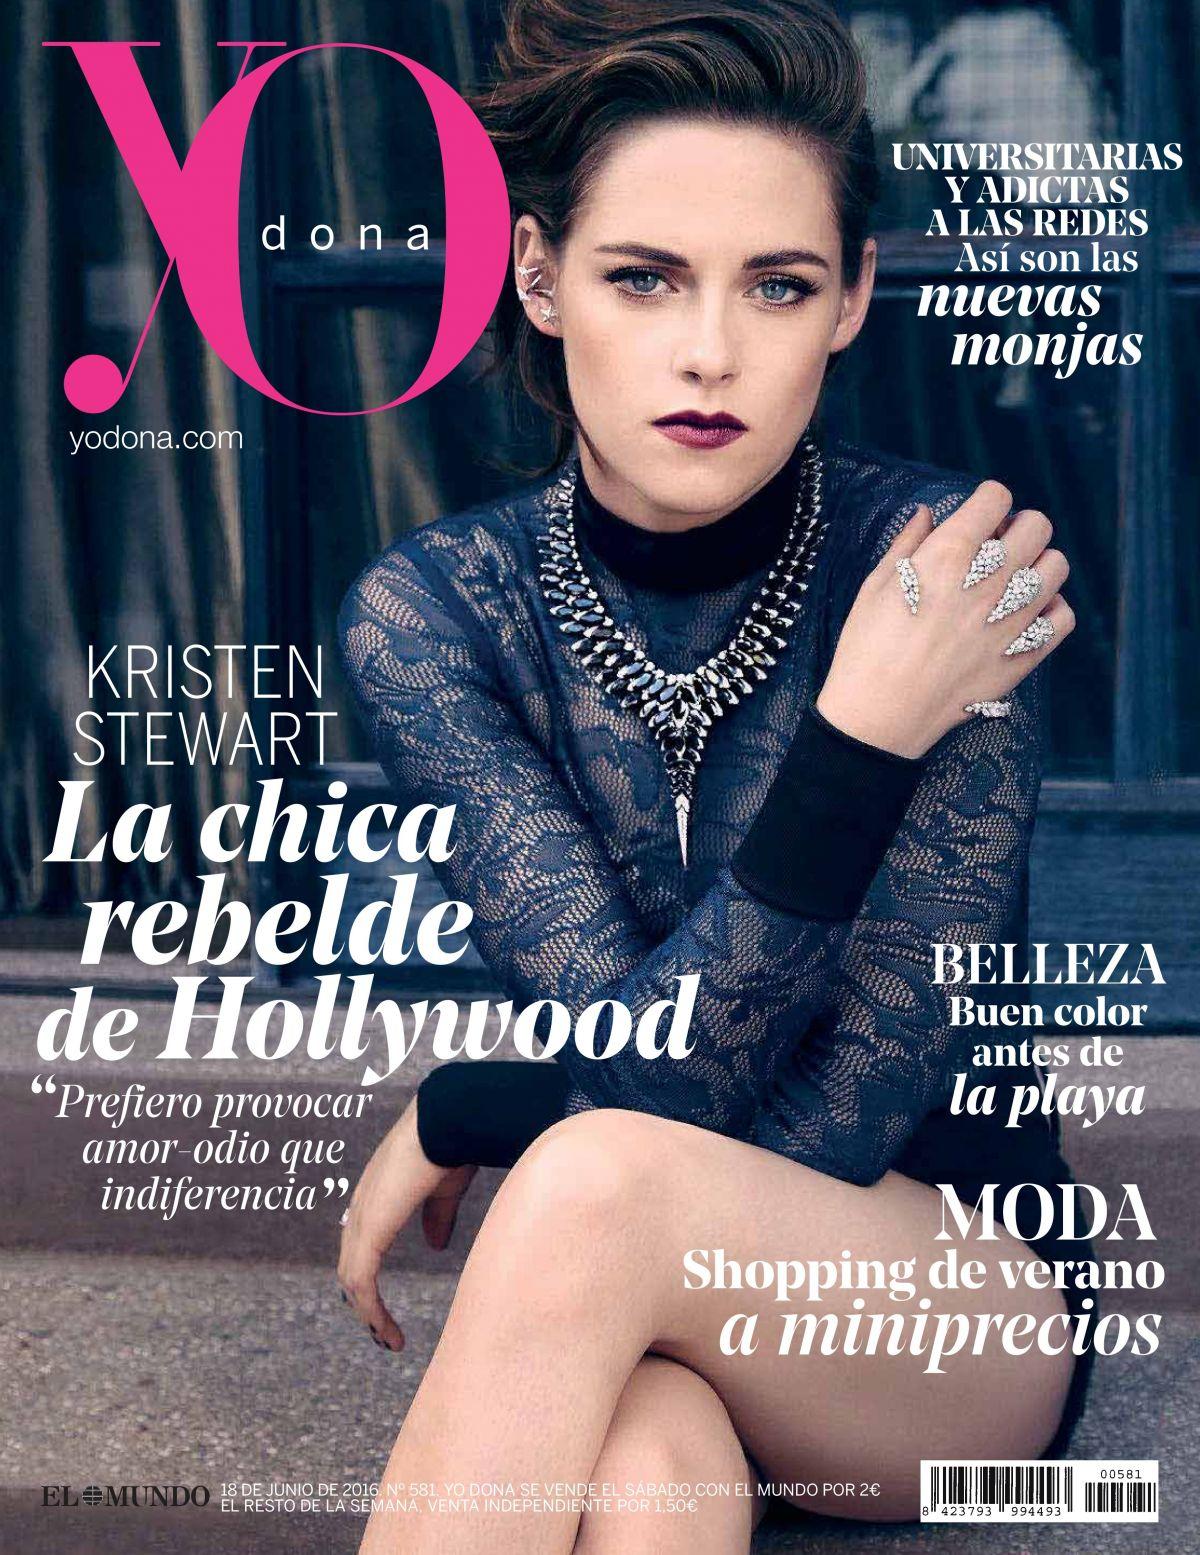 KRISTEN STEWART in Yo Dona Magazine, Spain June 2016